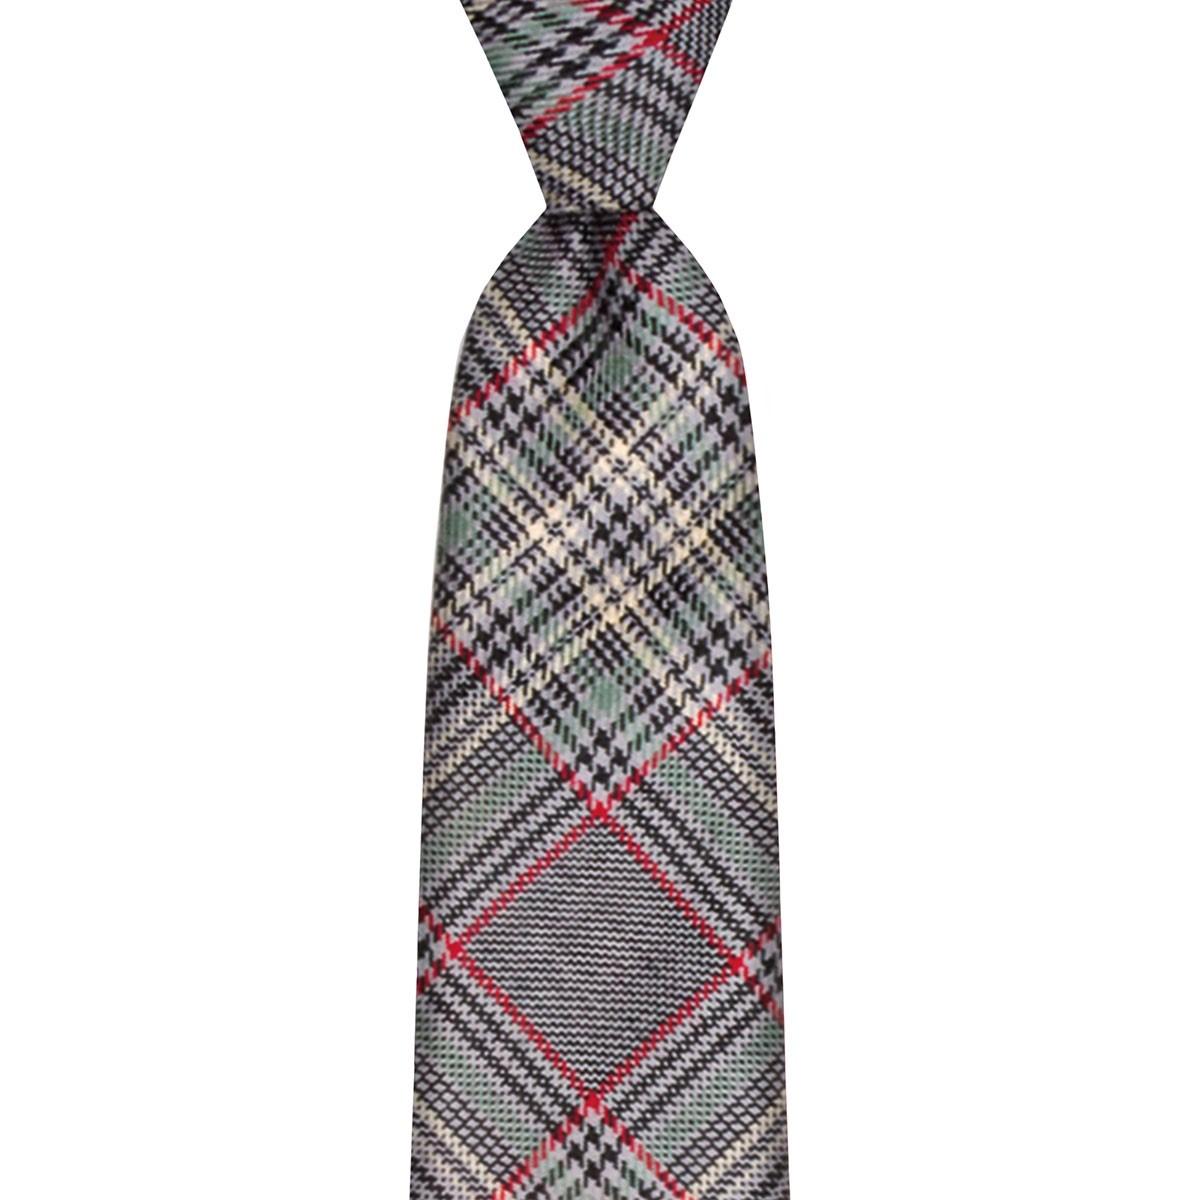 Plockton Check Tweed Wool Tie - Front